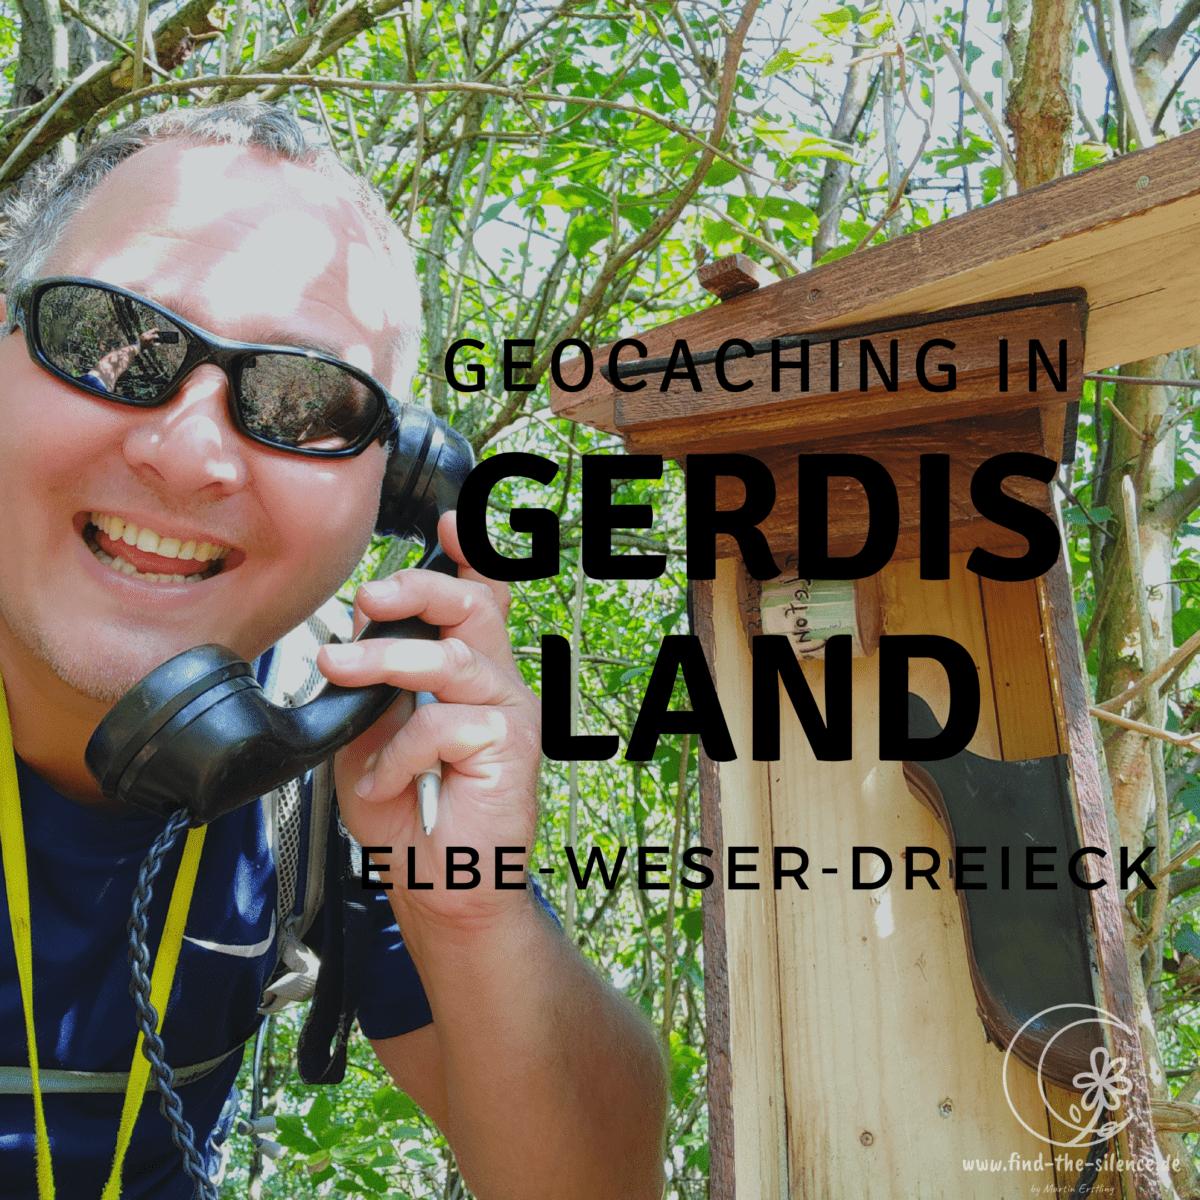 Geocaching in Gerdis Land